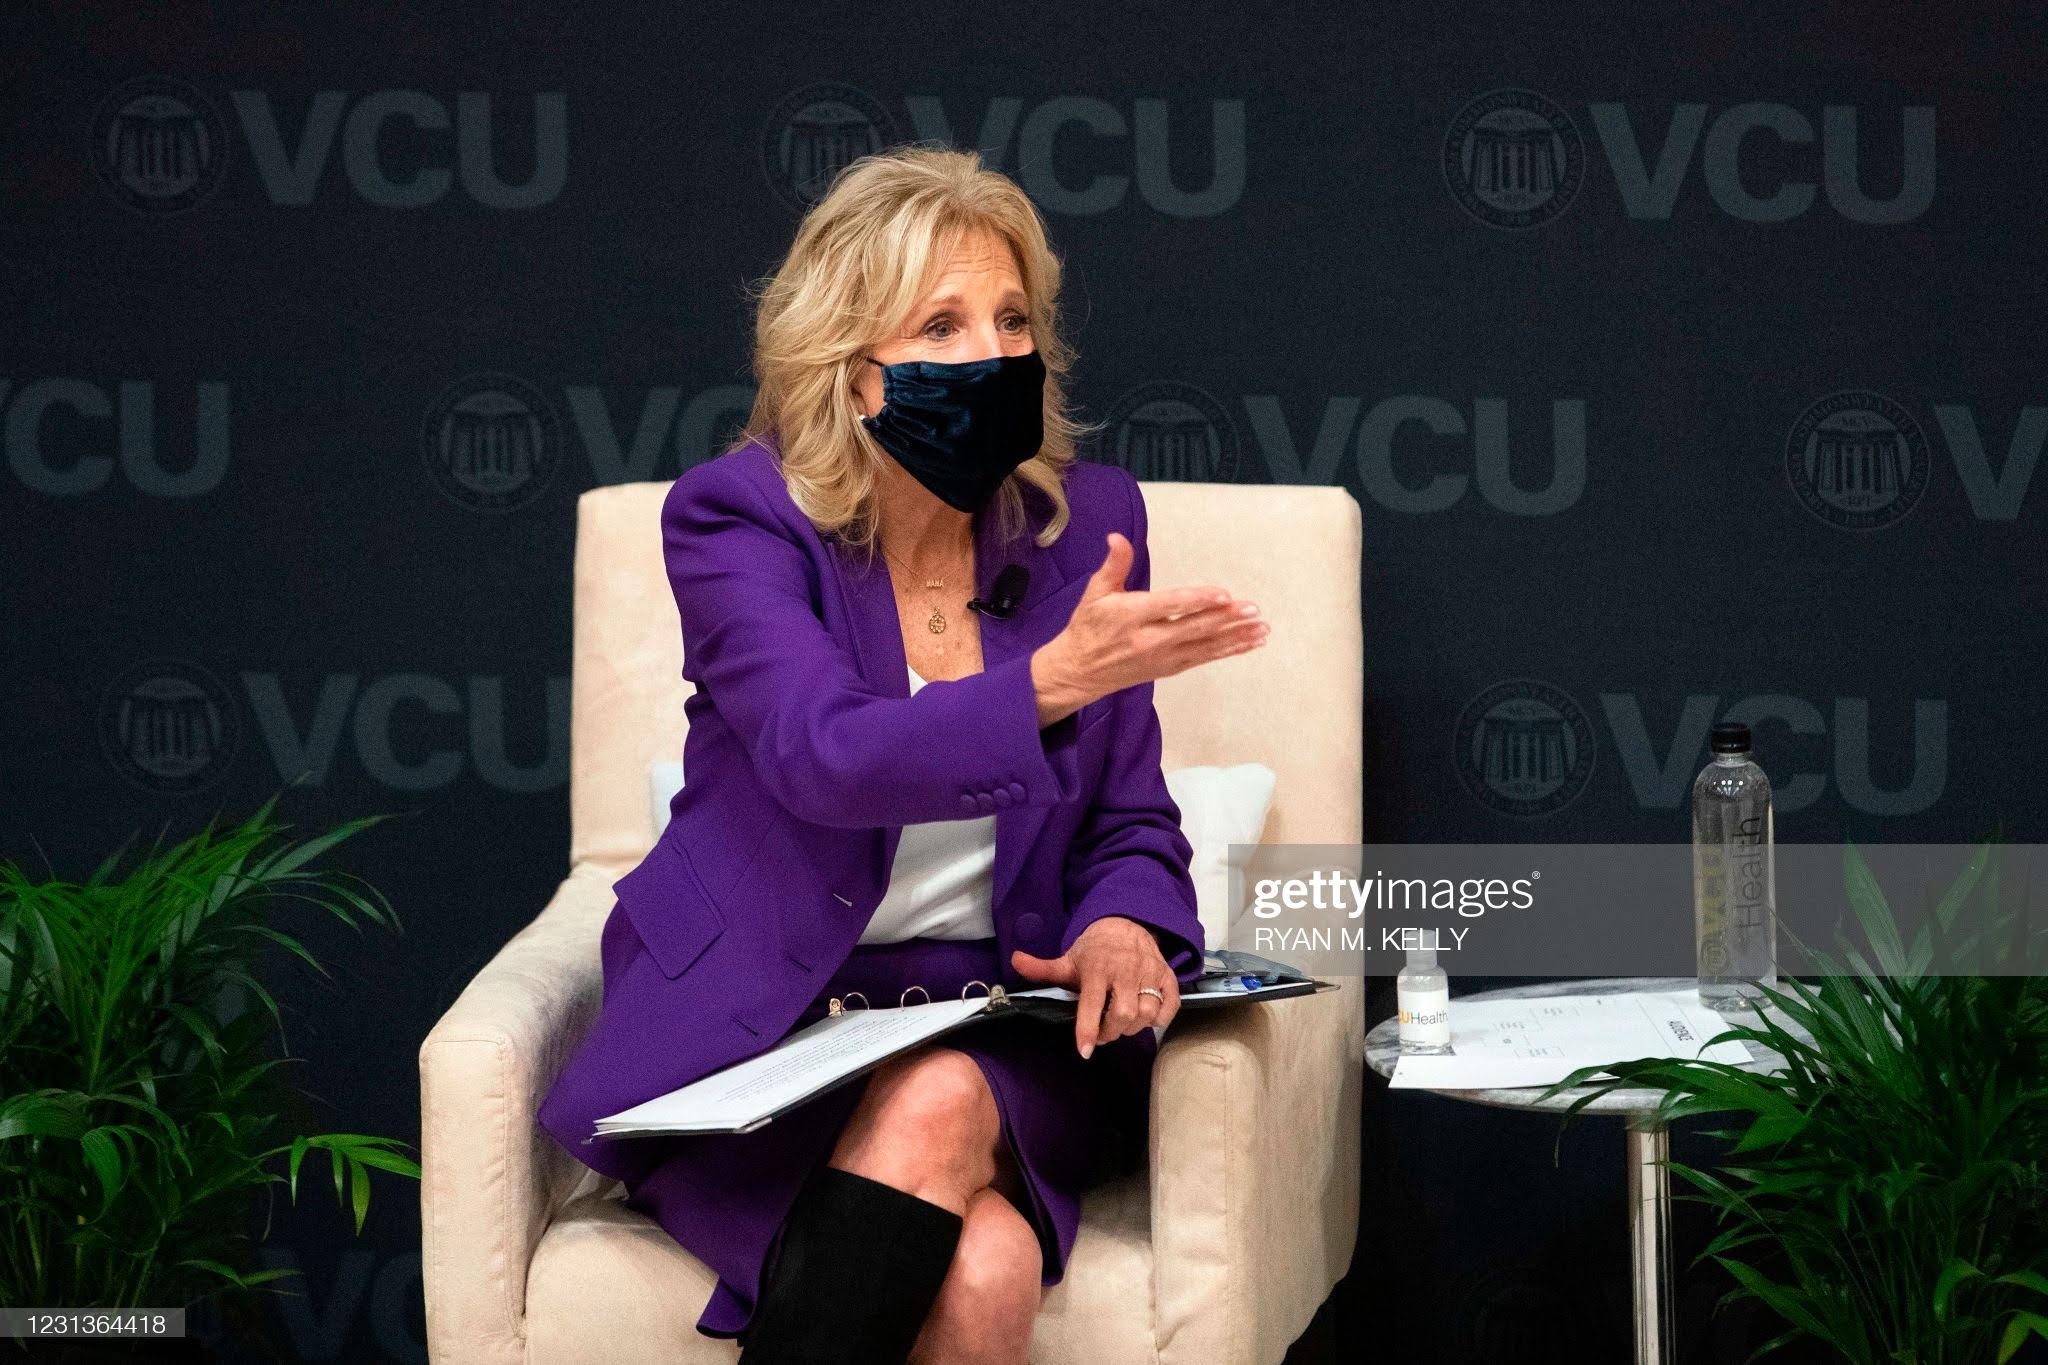 us-first-lady-dr-jill-biden-in-michael-kors-visit-the-vcu-massey-cancer-center